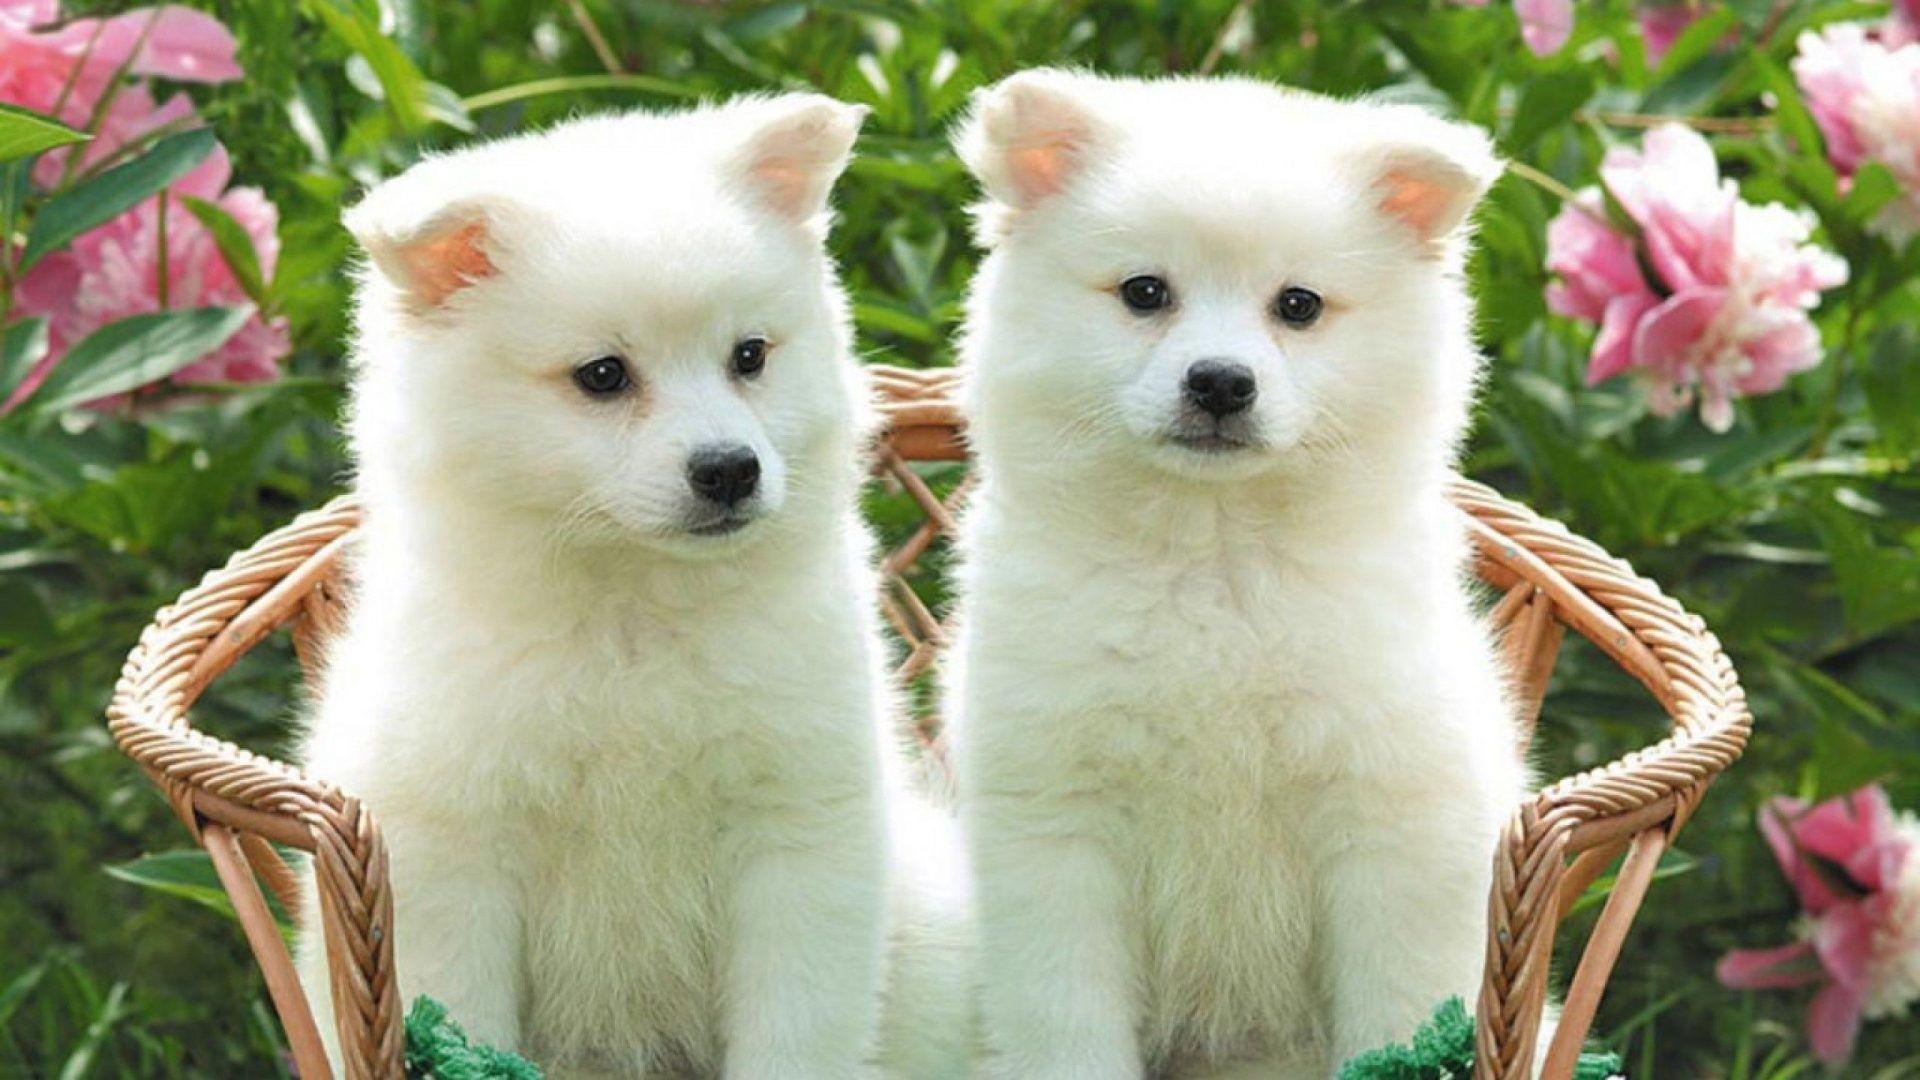 Cute White Puppies Widescreen Wallpaper 1920x1080 Samye Milye Zhivotnye Amerikanskij Eskimosskij Shpic Milye Shenki